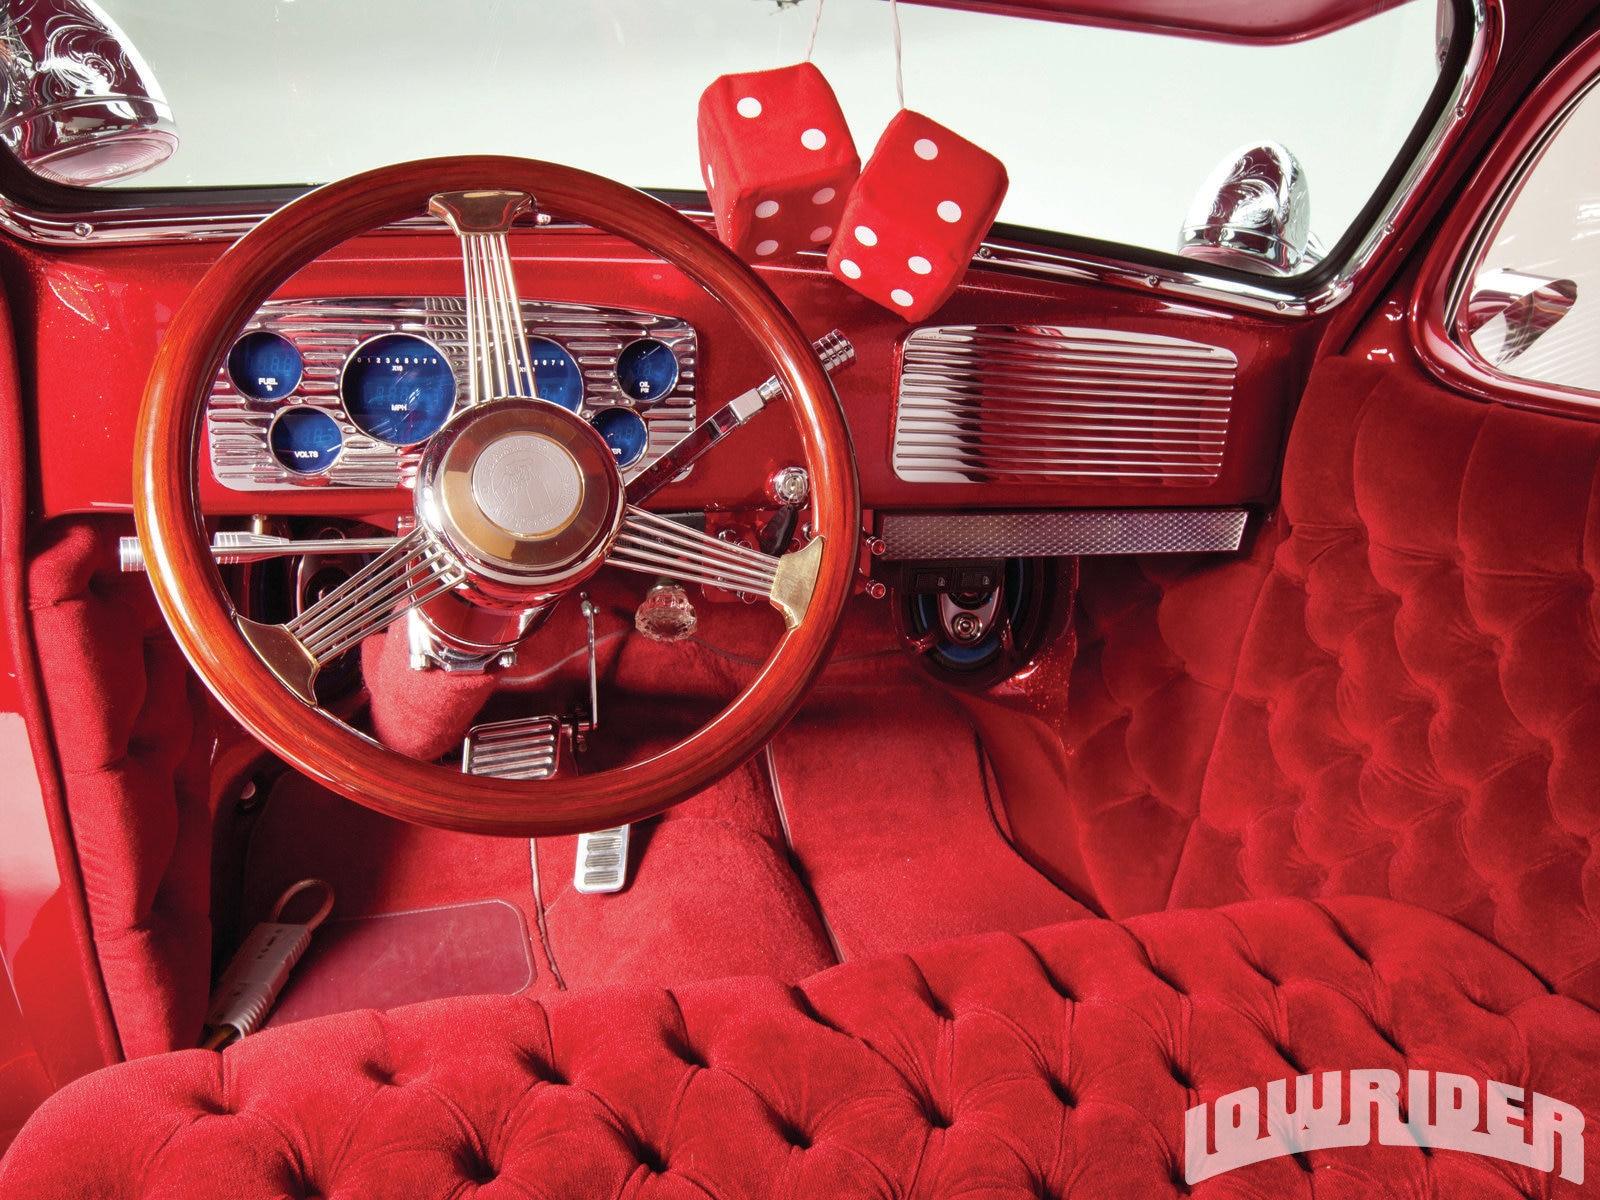 1936 Chevrolet Master Deluxe - Lowrider Magazine